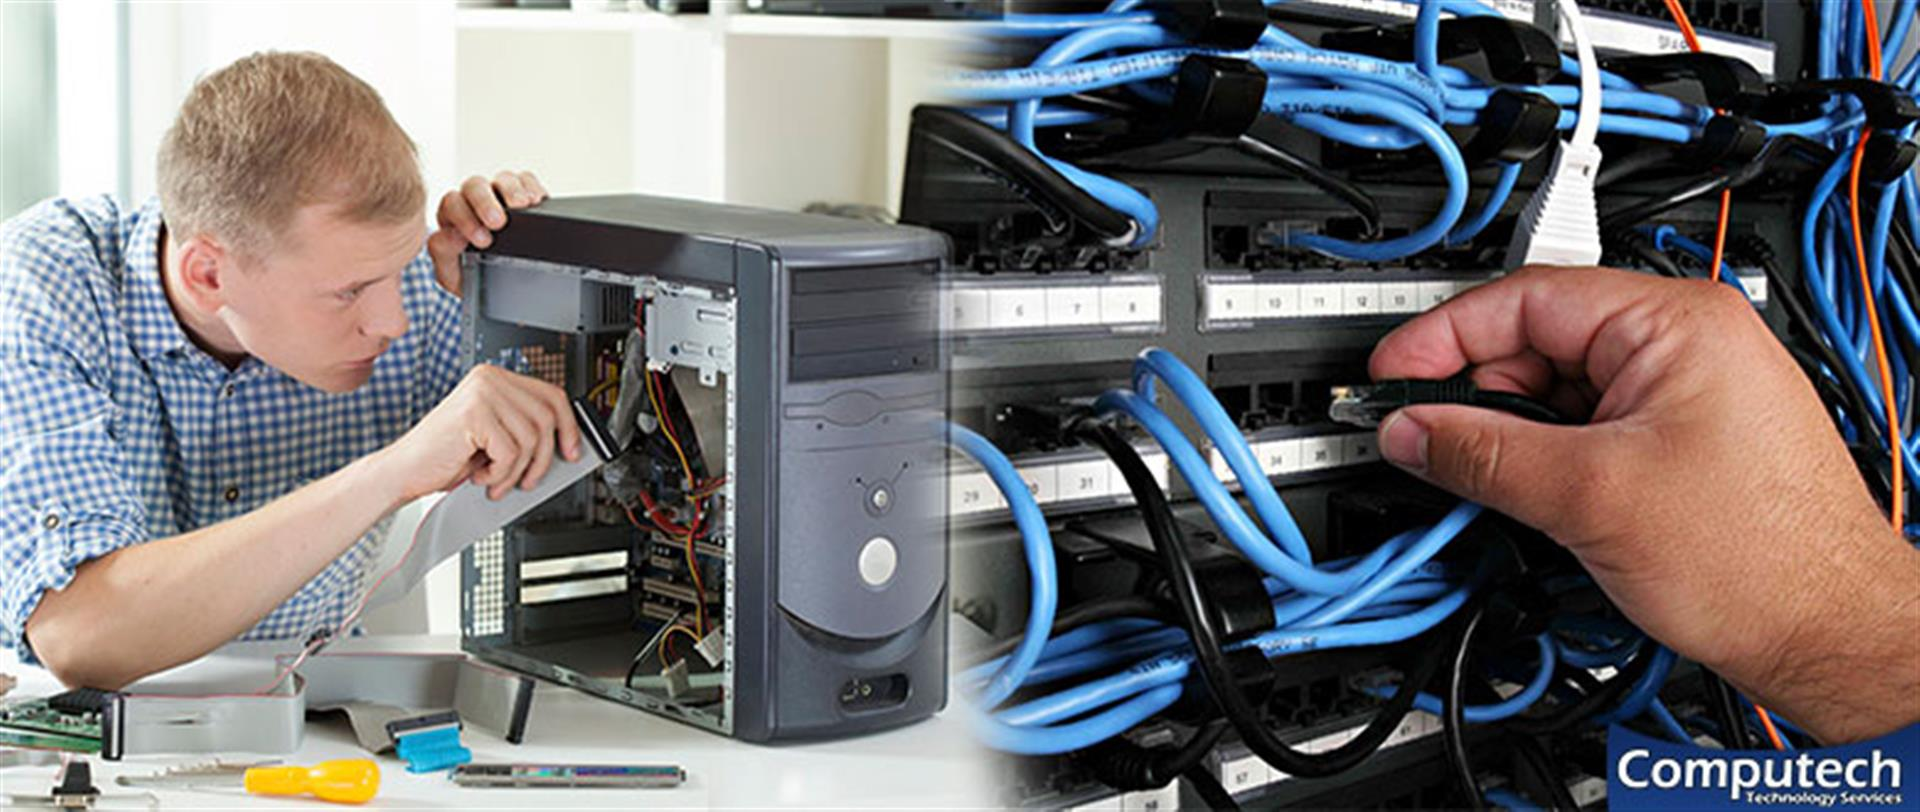 Sahuarita Arizona Onsite Computer PC & Printer Repairs, Networking, Voice and Broadband Data Low Voltage Cabling Solutions